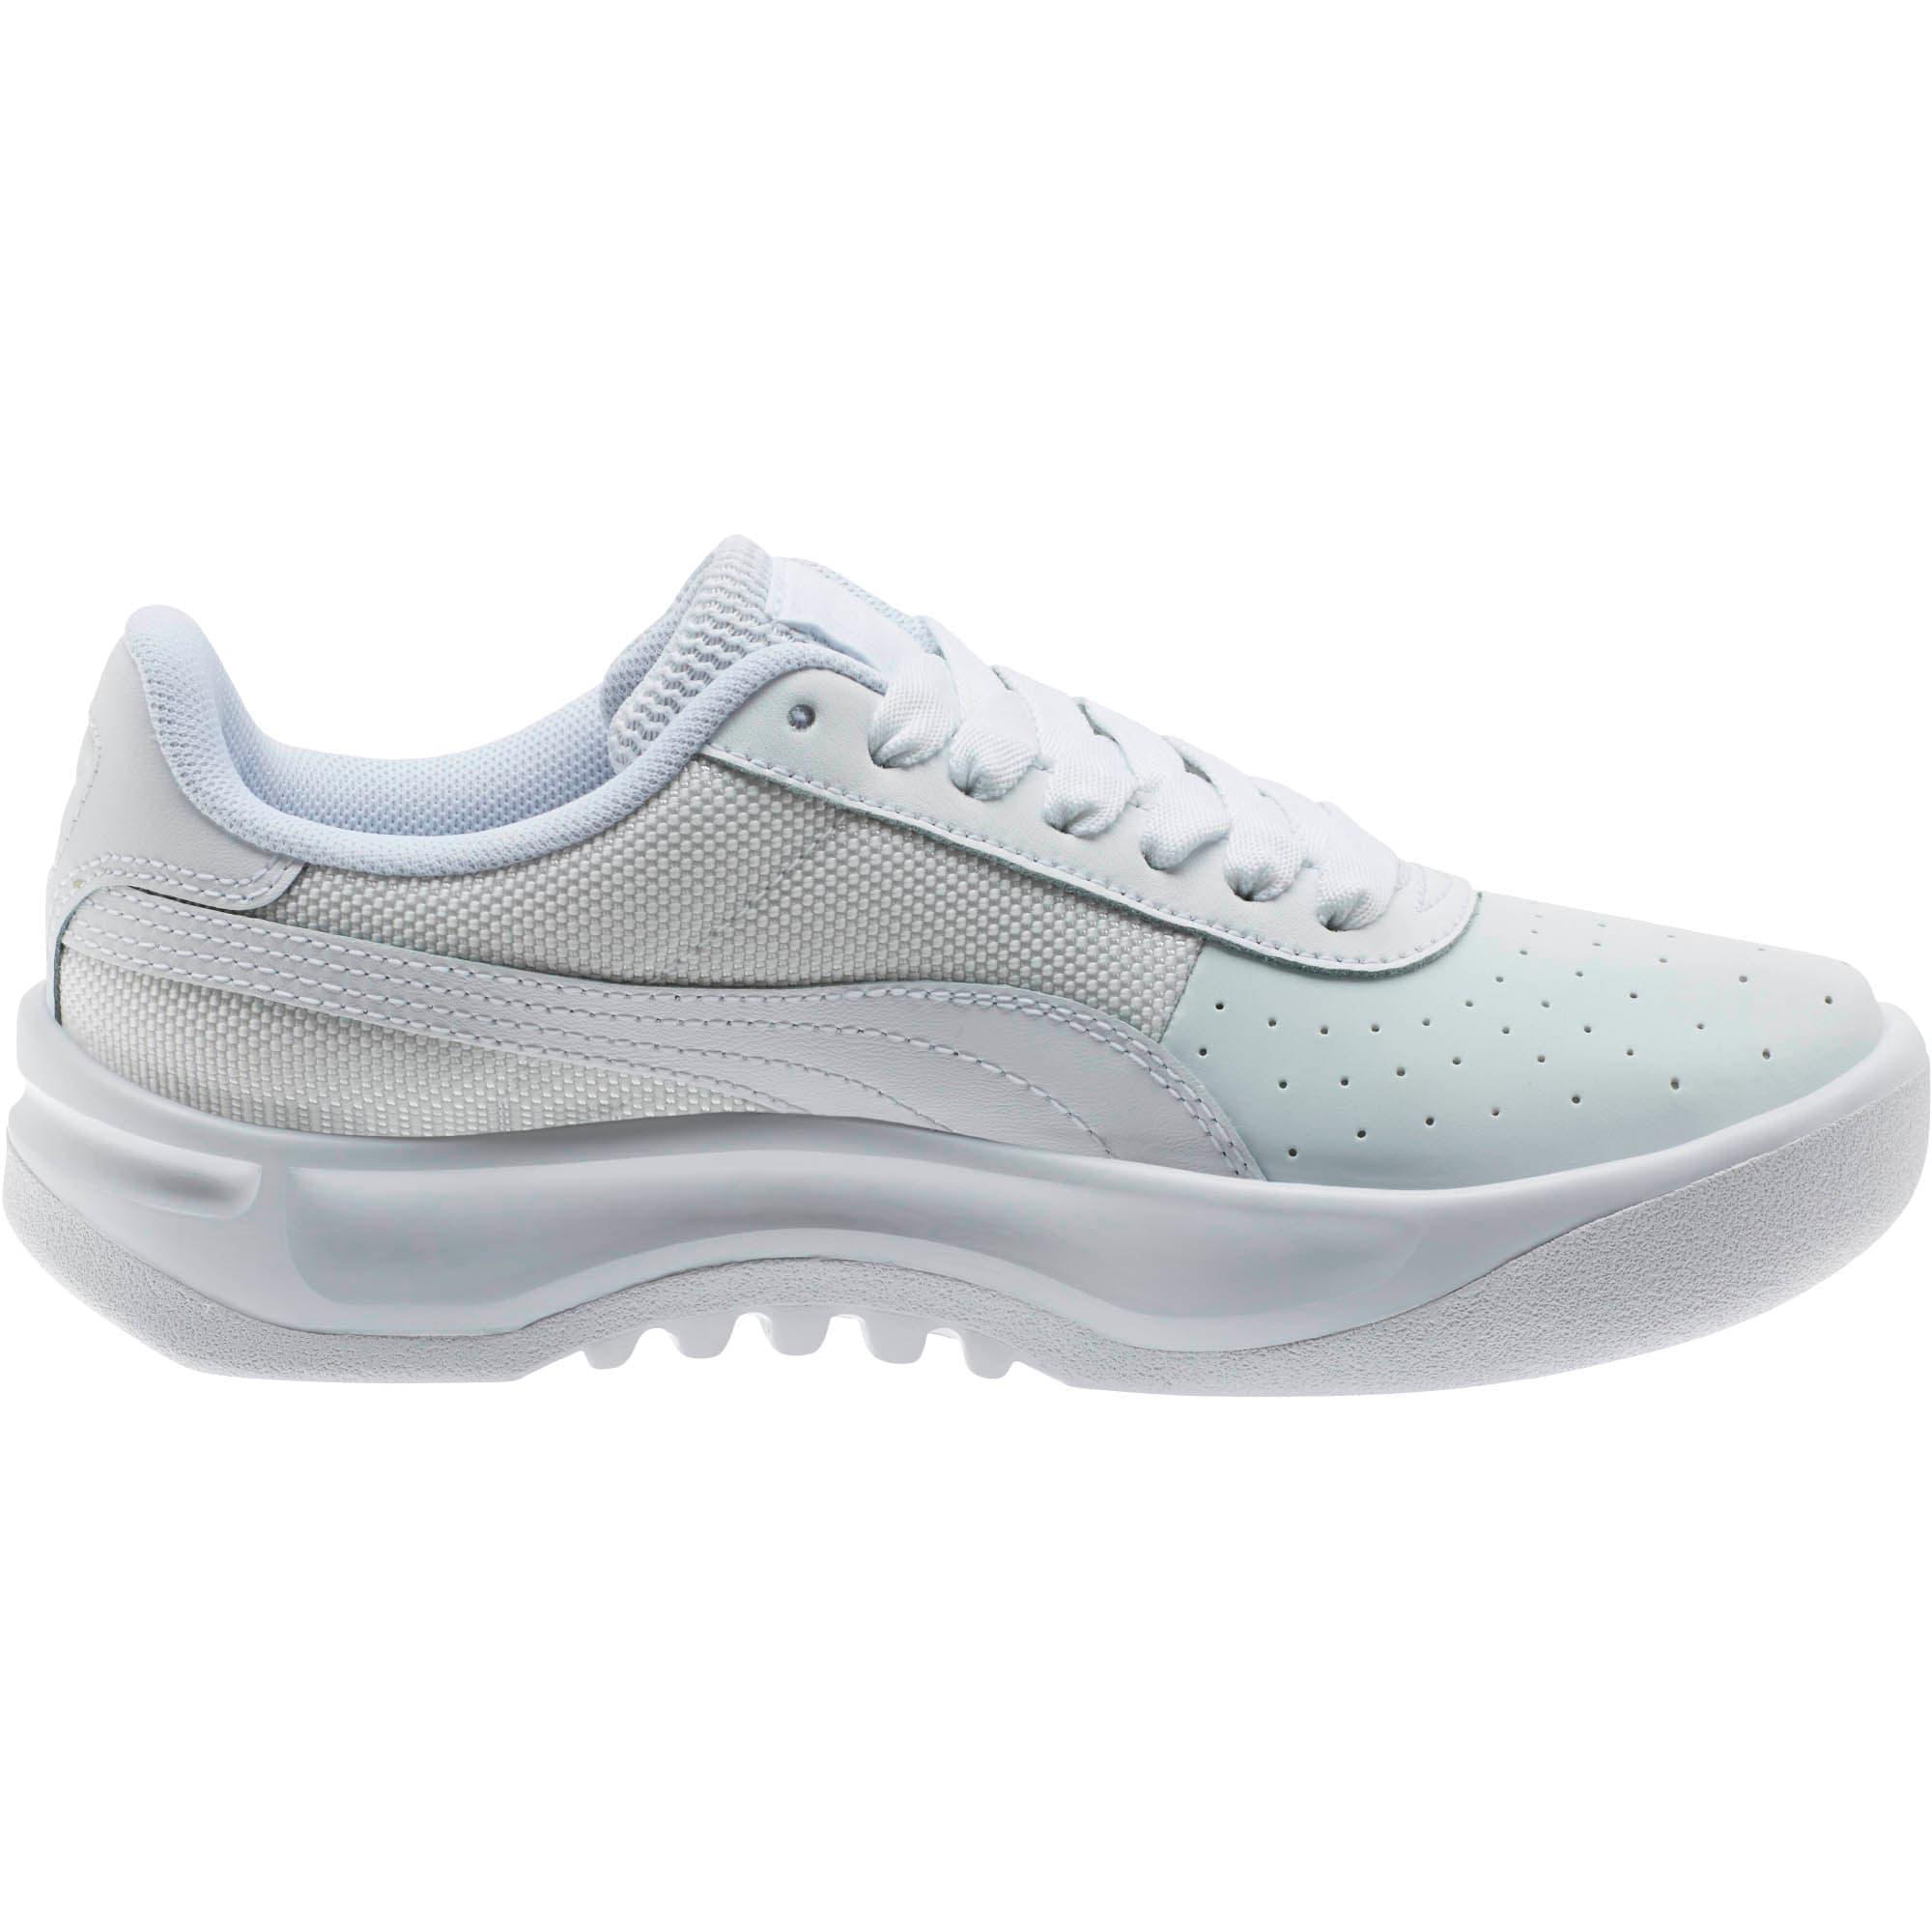 Thumbnail 4 of California Sneakers JR, P White-P White-P White, medium